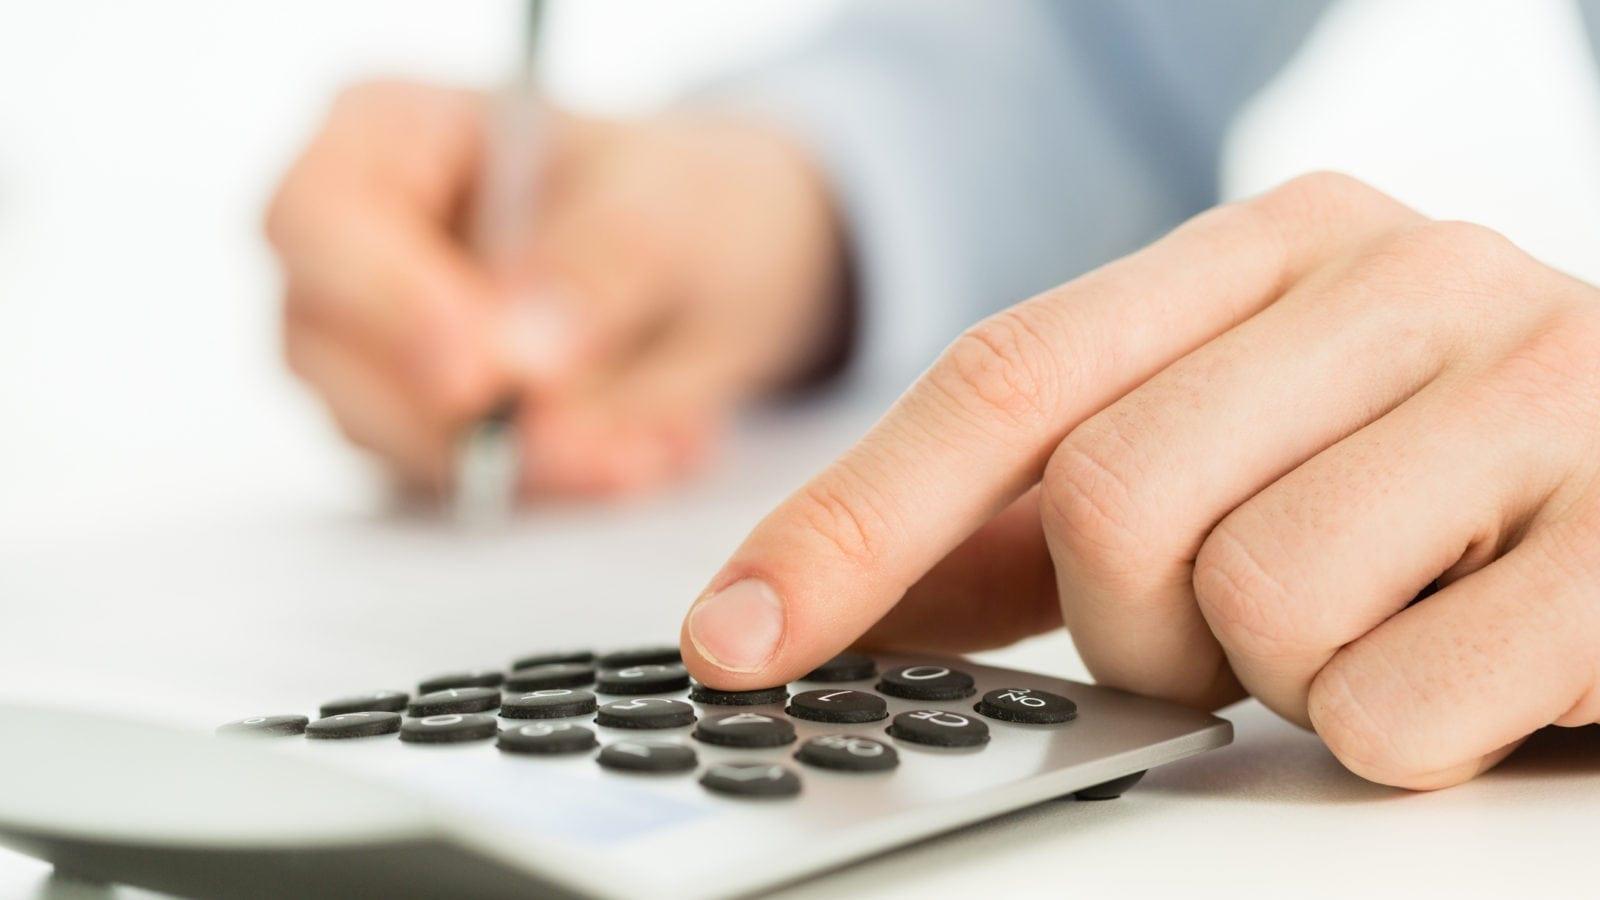 Hand On A Calculator Stock Photo